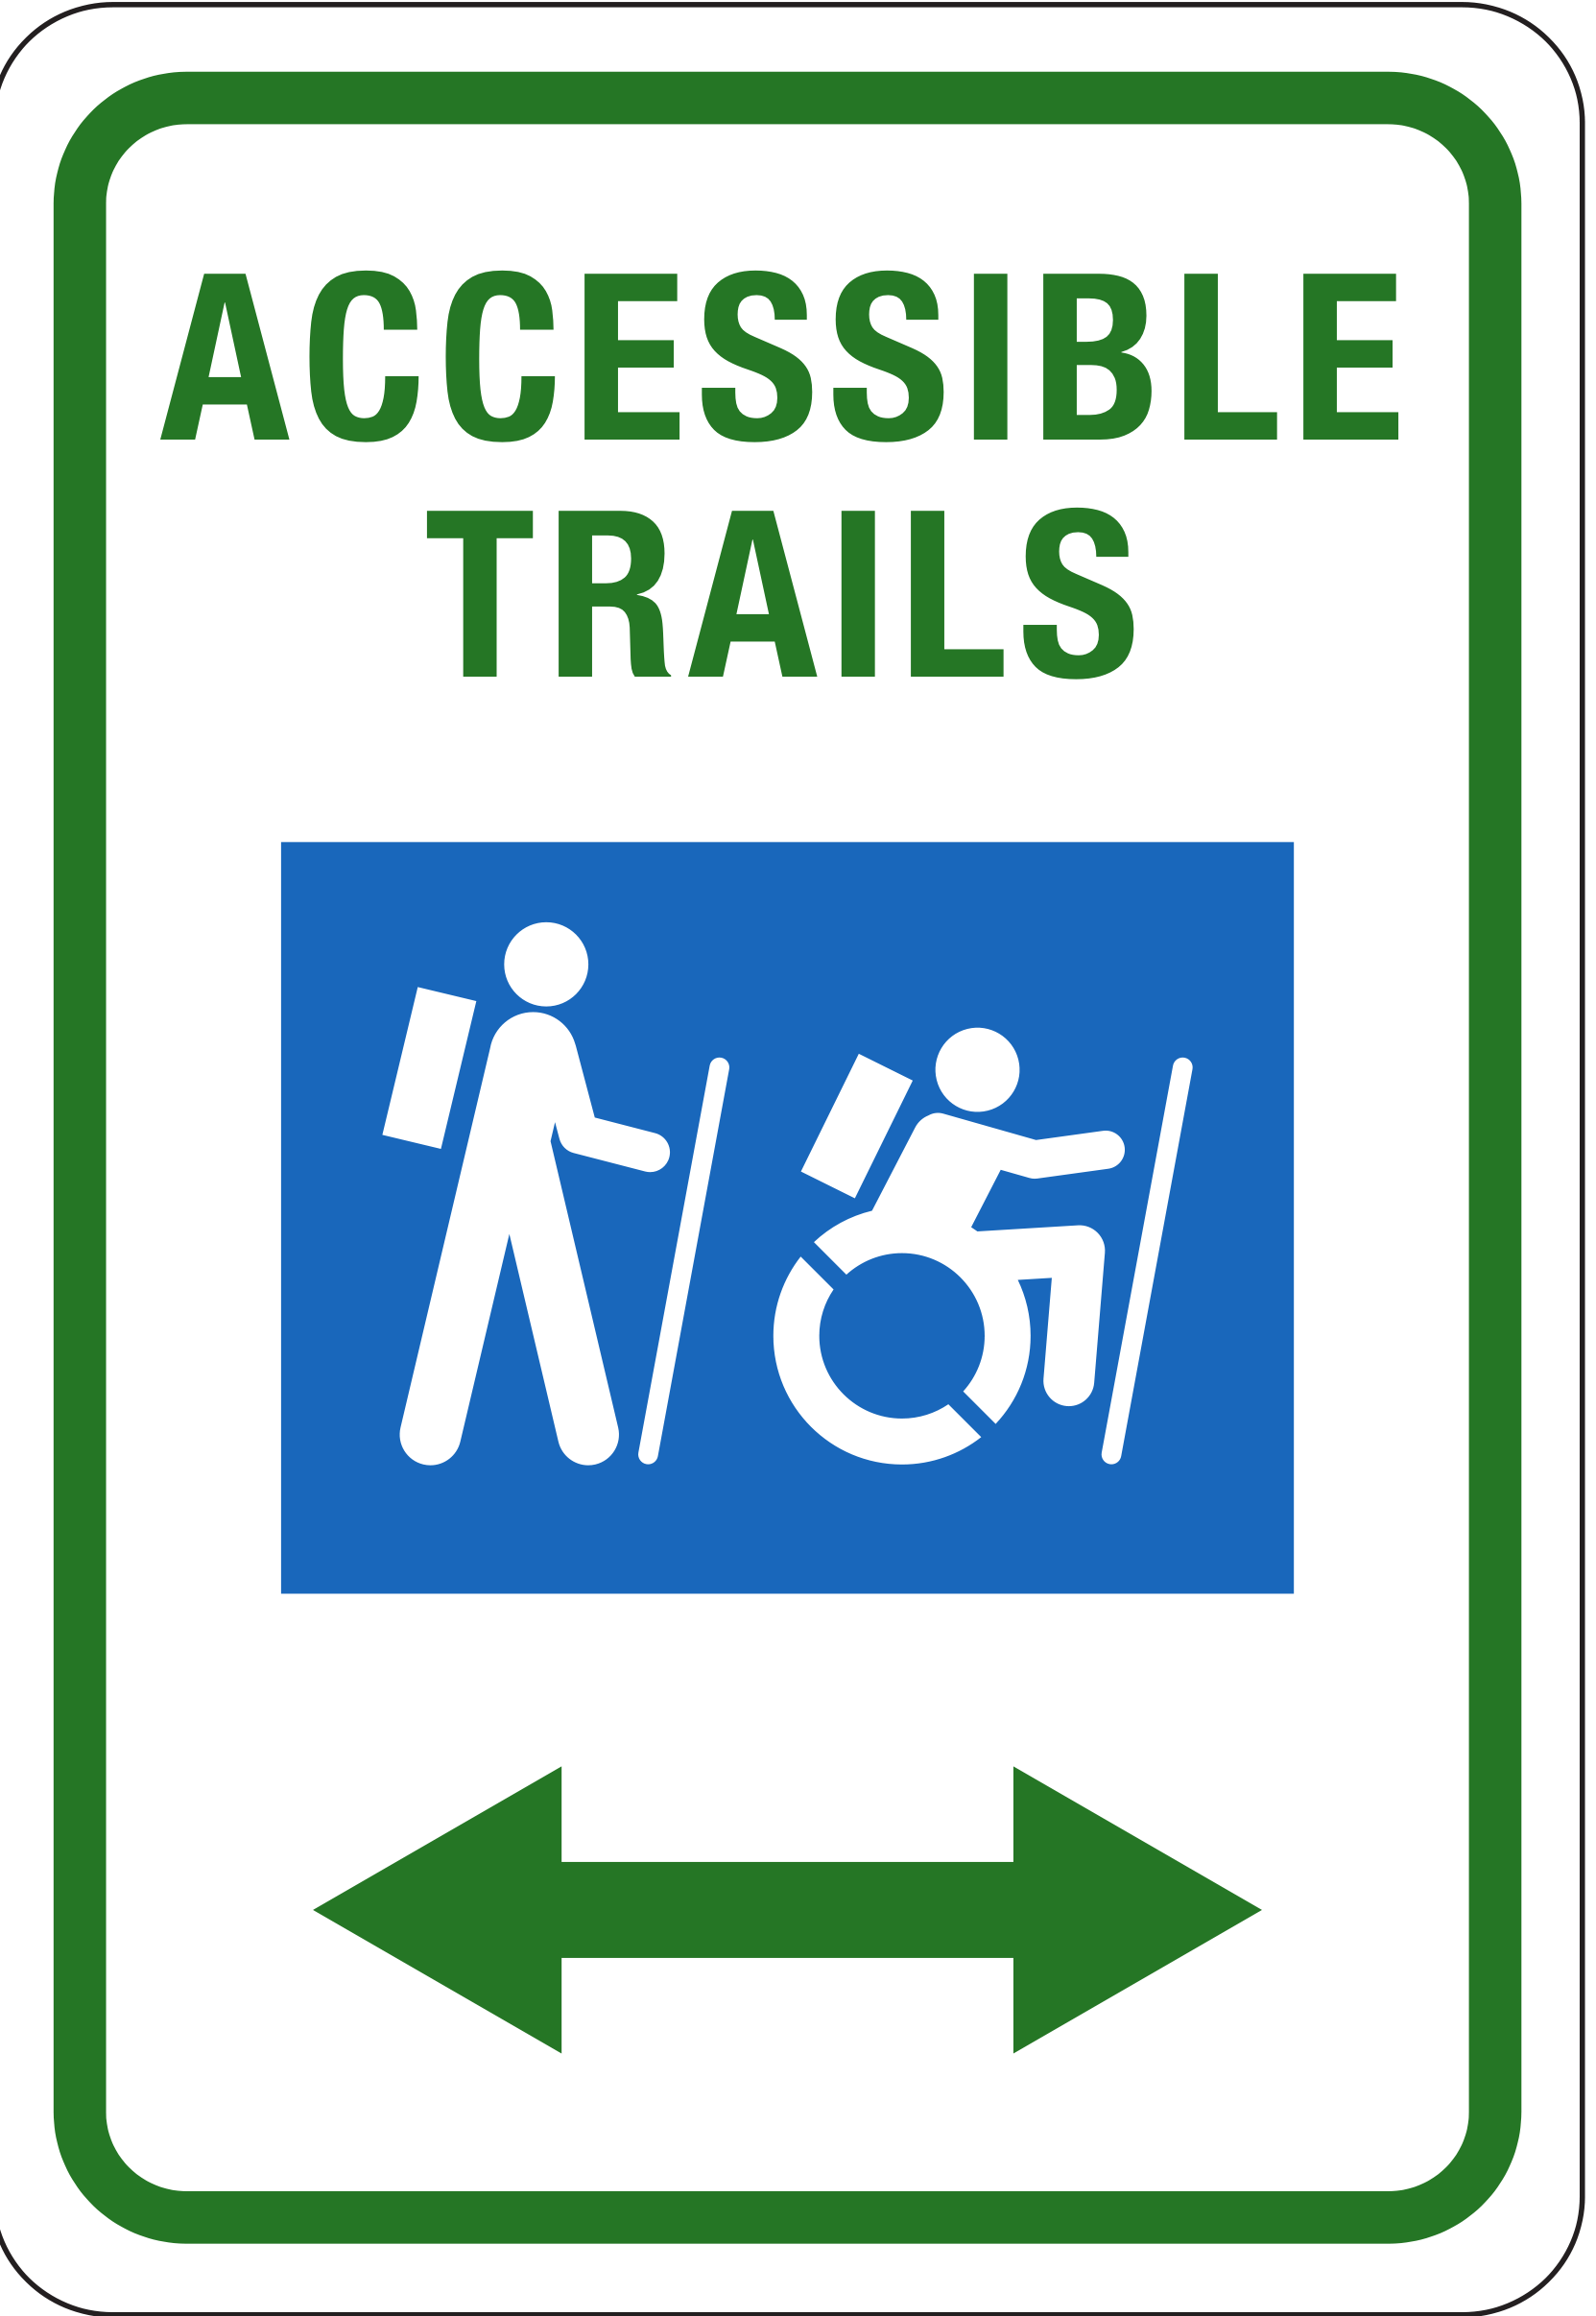 AccessibleTrailsBothWays.png